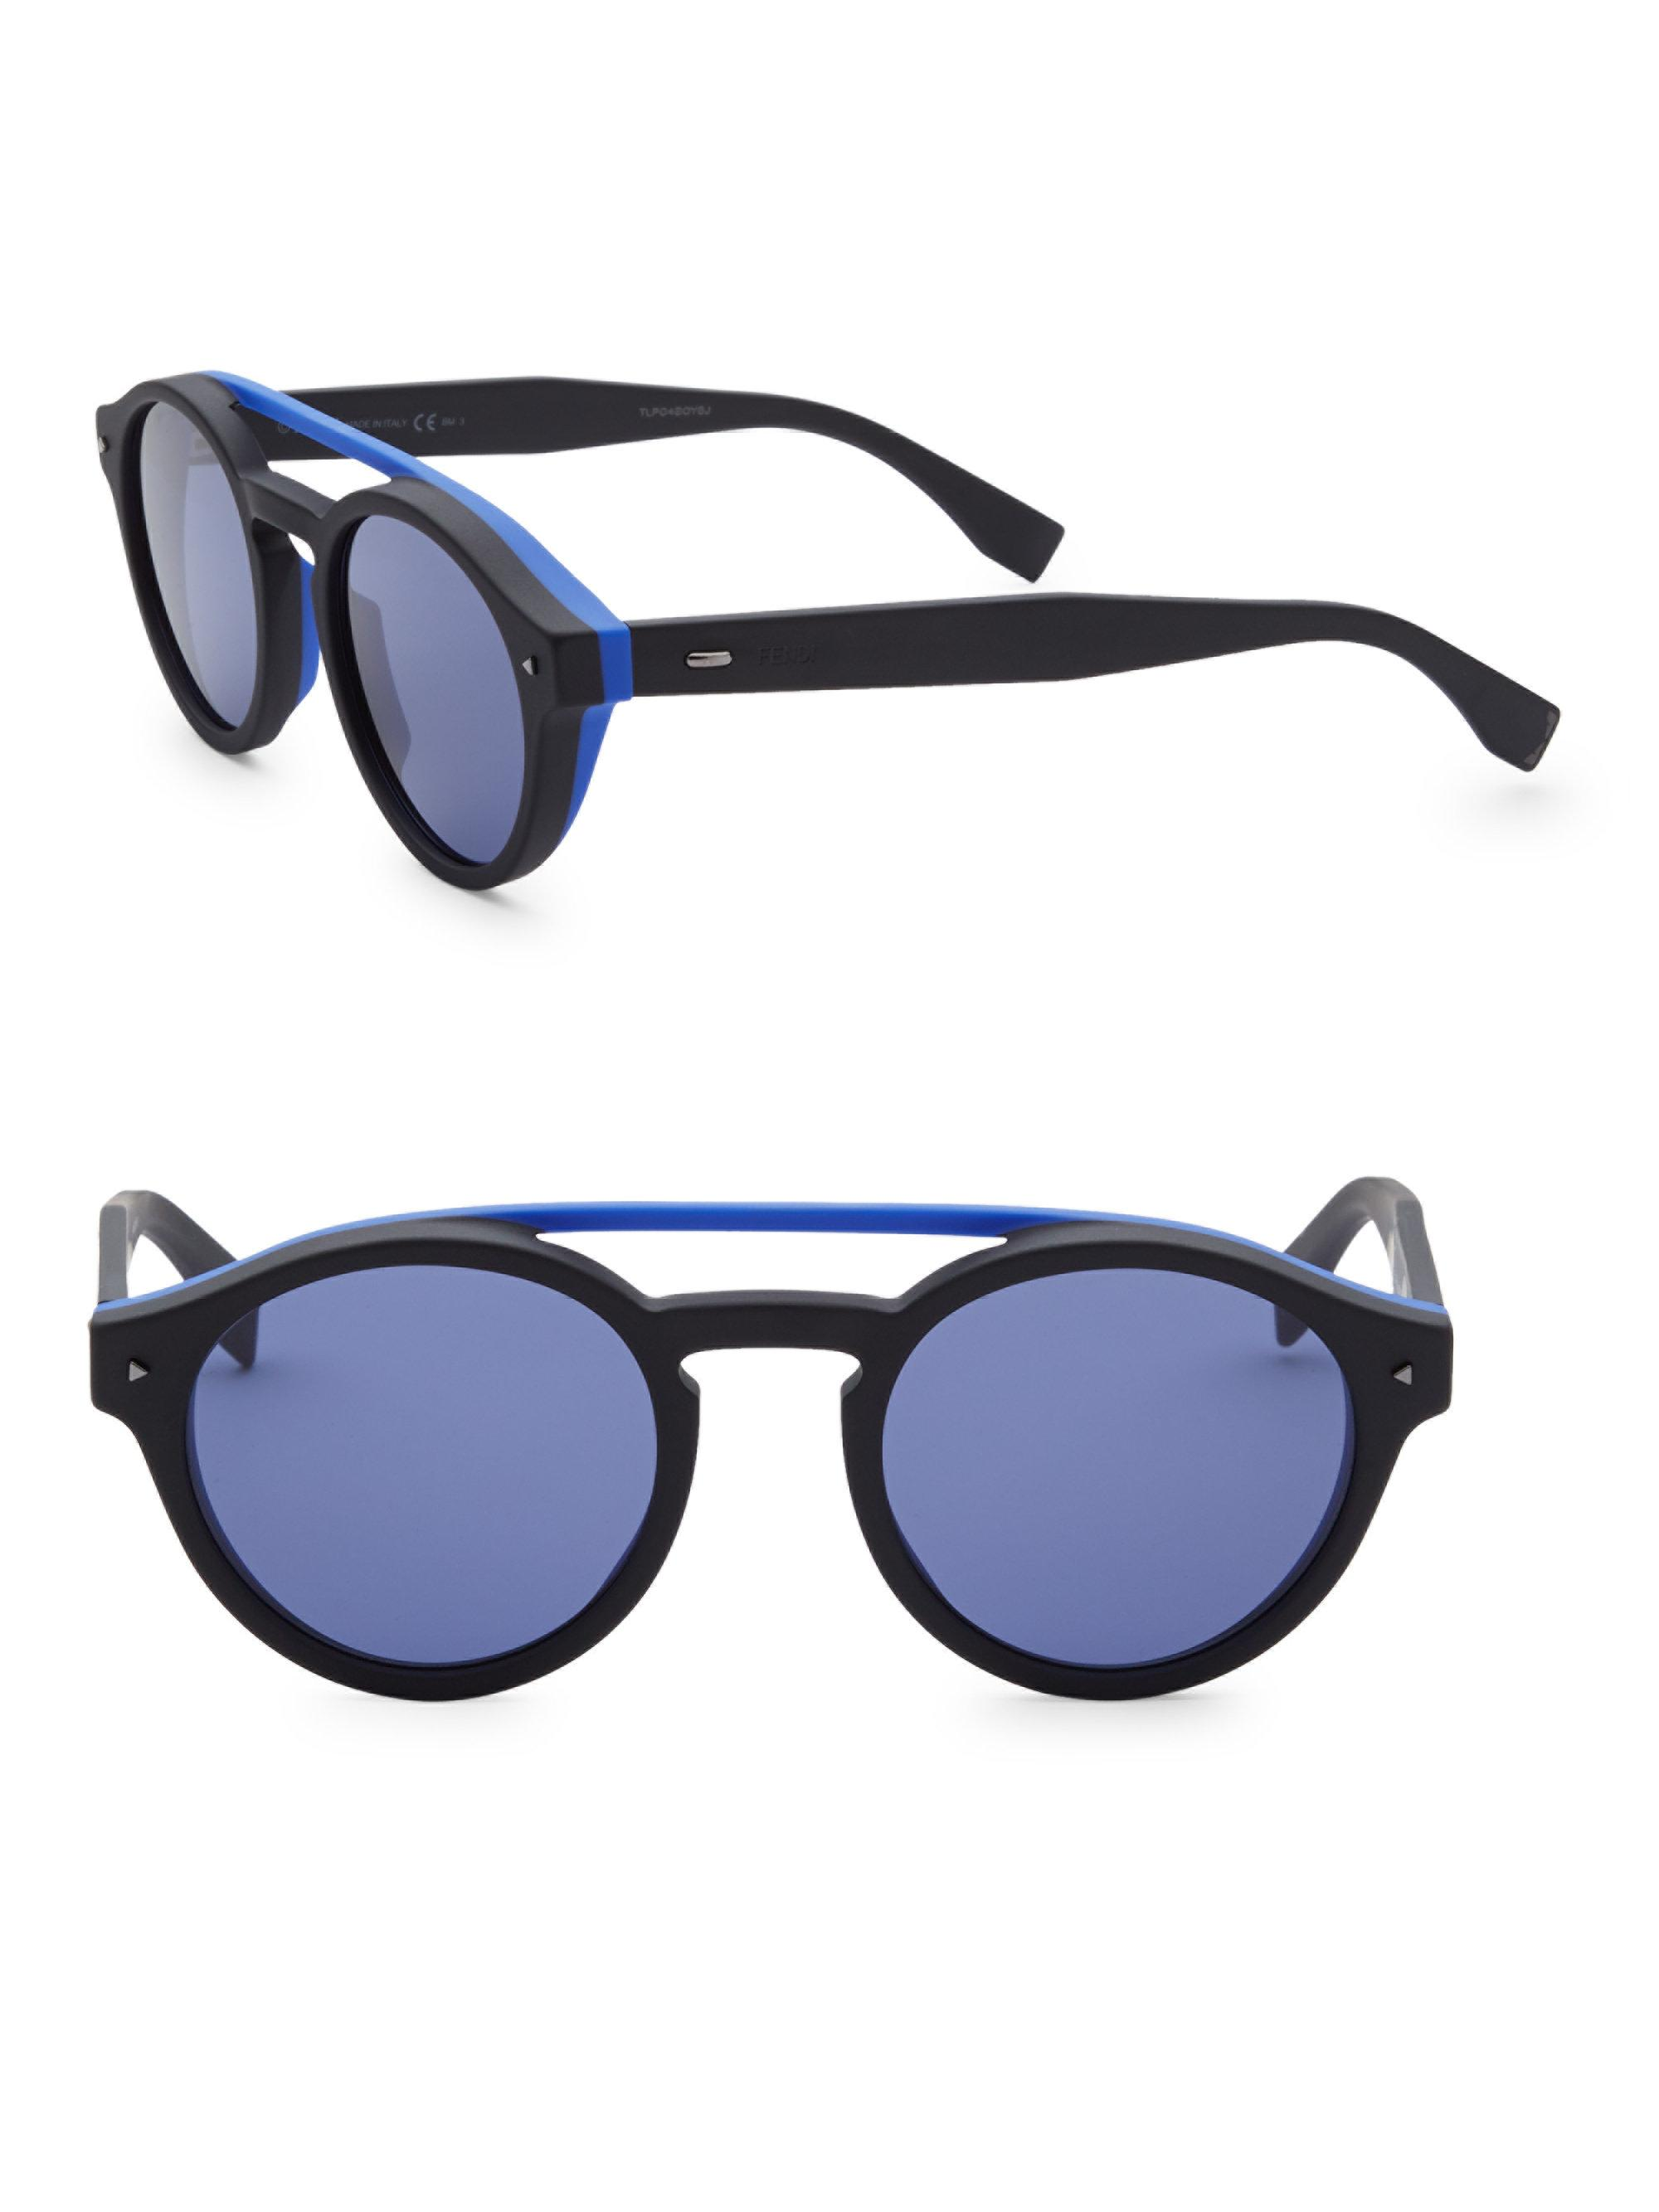 8c0a6c83308 Fendi. Men s 51mm Round Sunglasses - Black.  522 From Saks Fifth Avenue